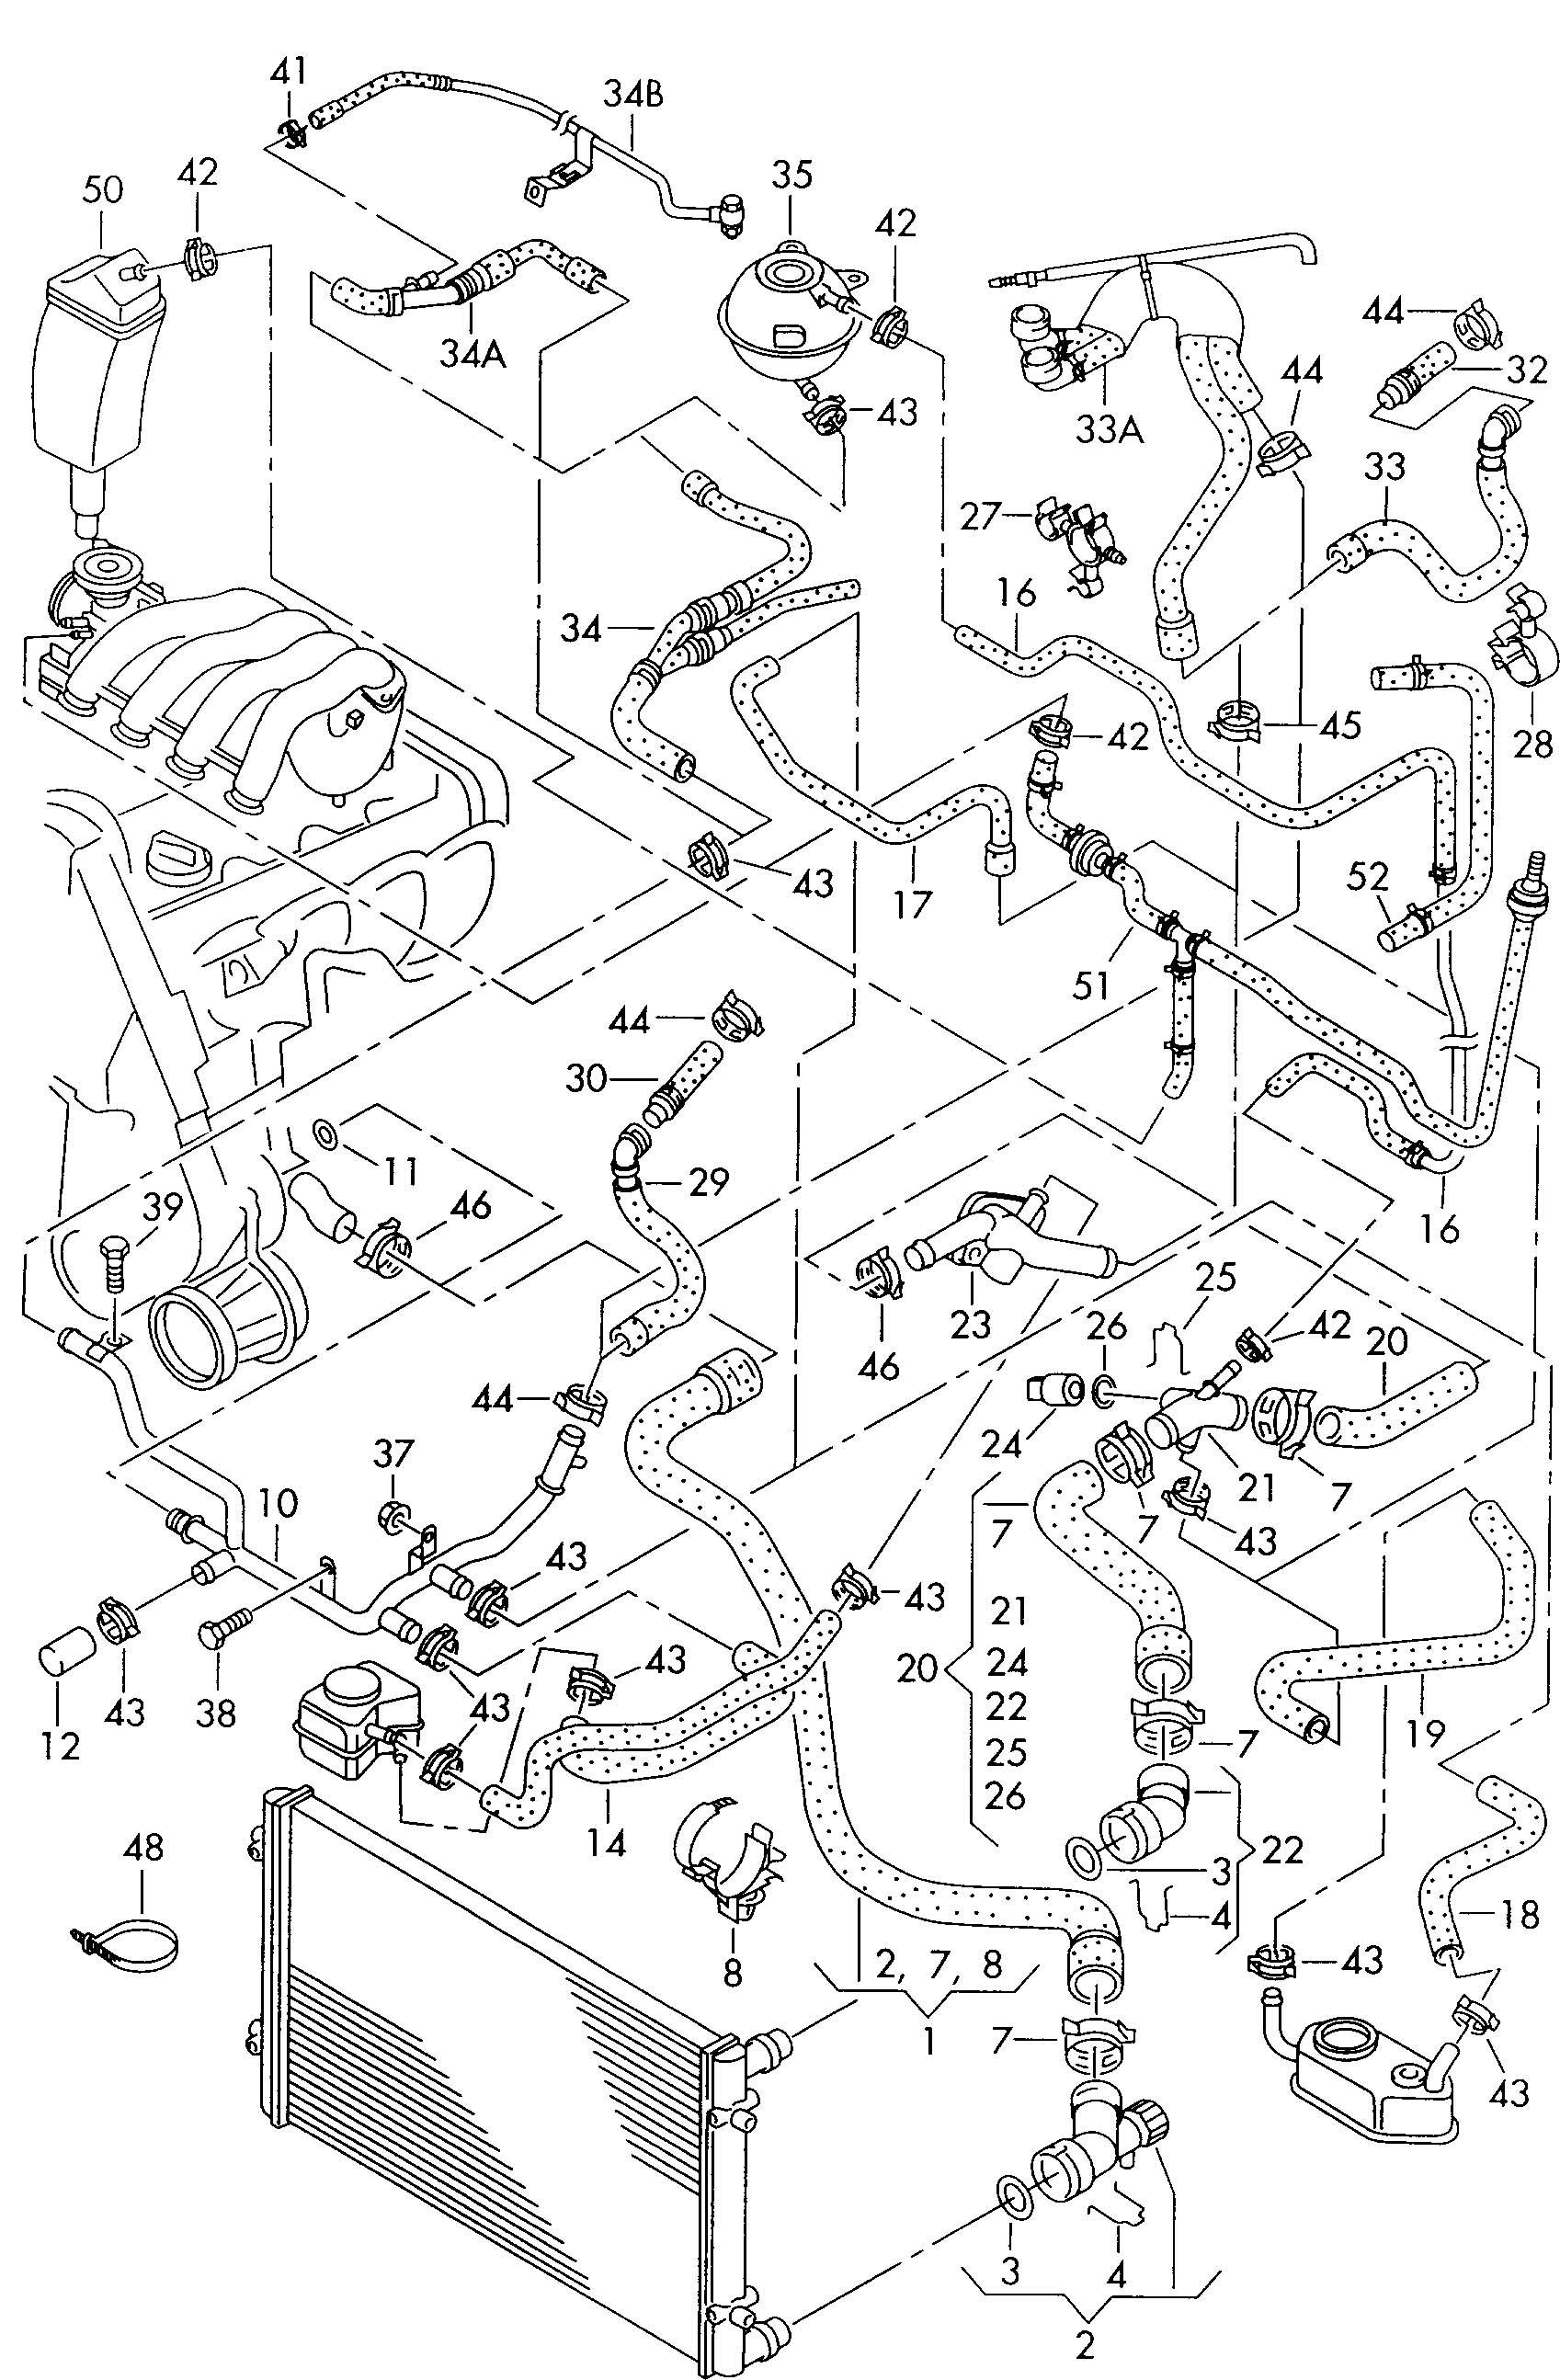 Volkswagen Golf 1.8L Turbo Water hose (flange > water pipe